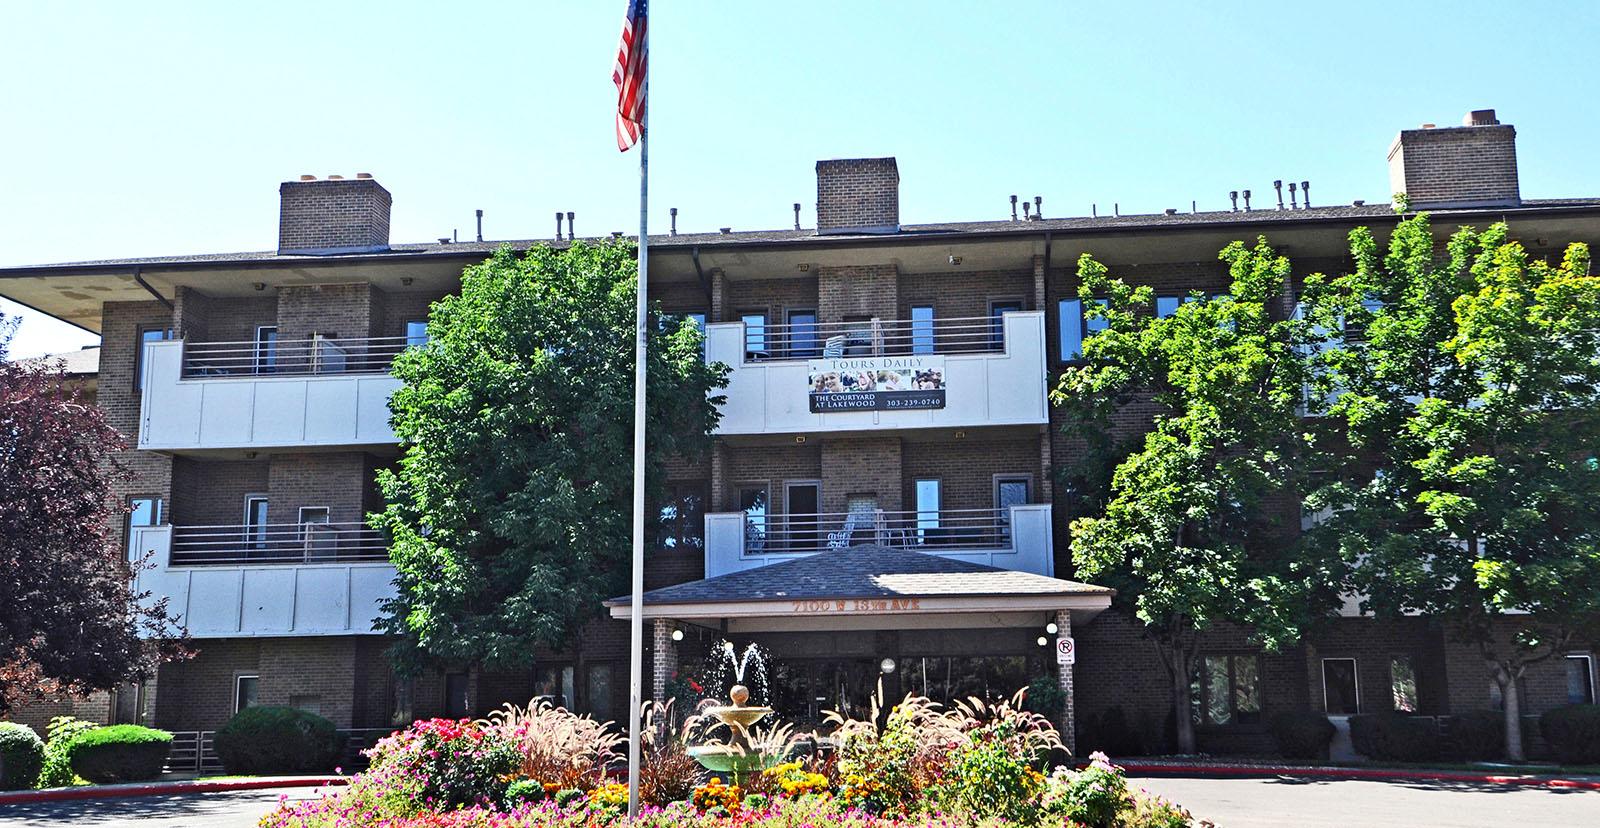 The Courtyard at Lakewood image 3